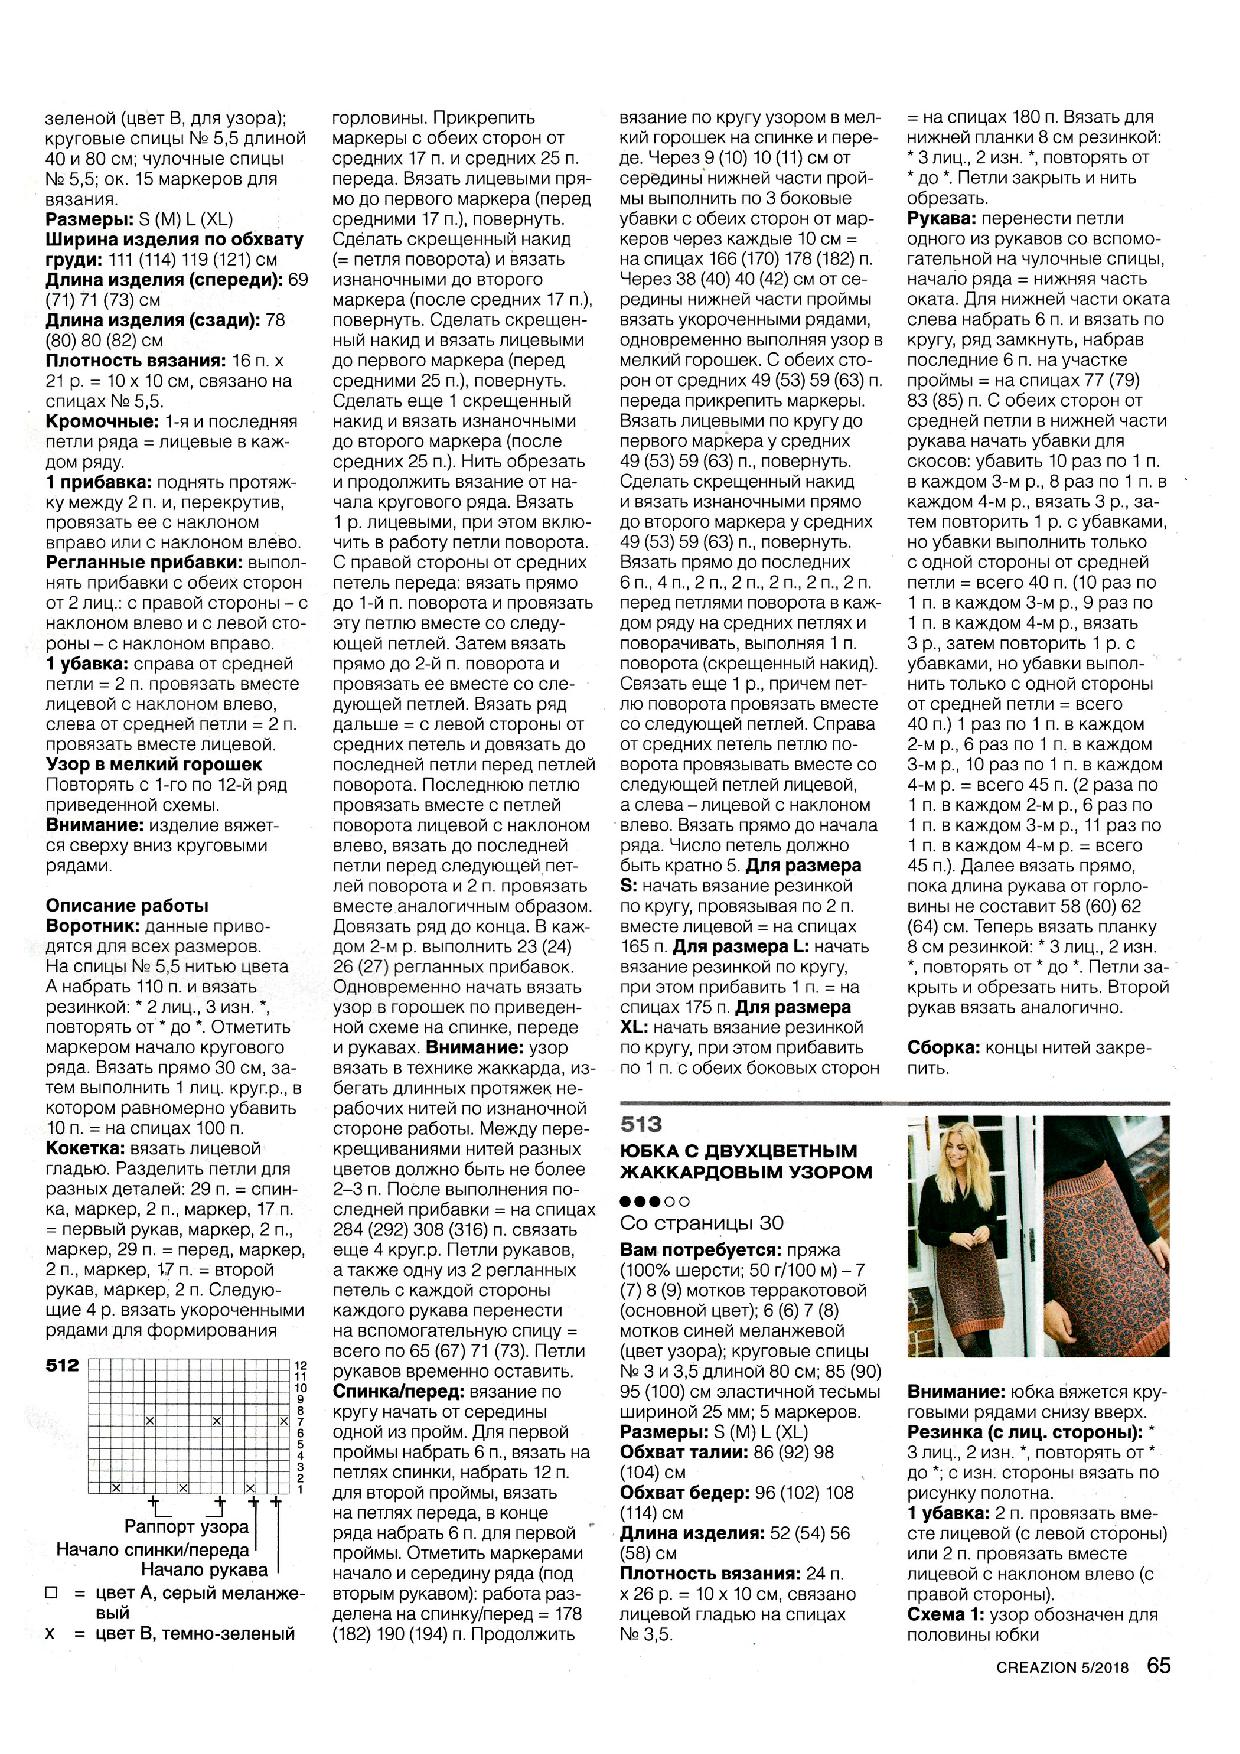 Page_00065.jpg